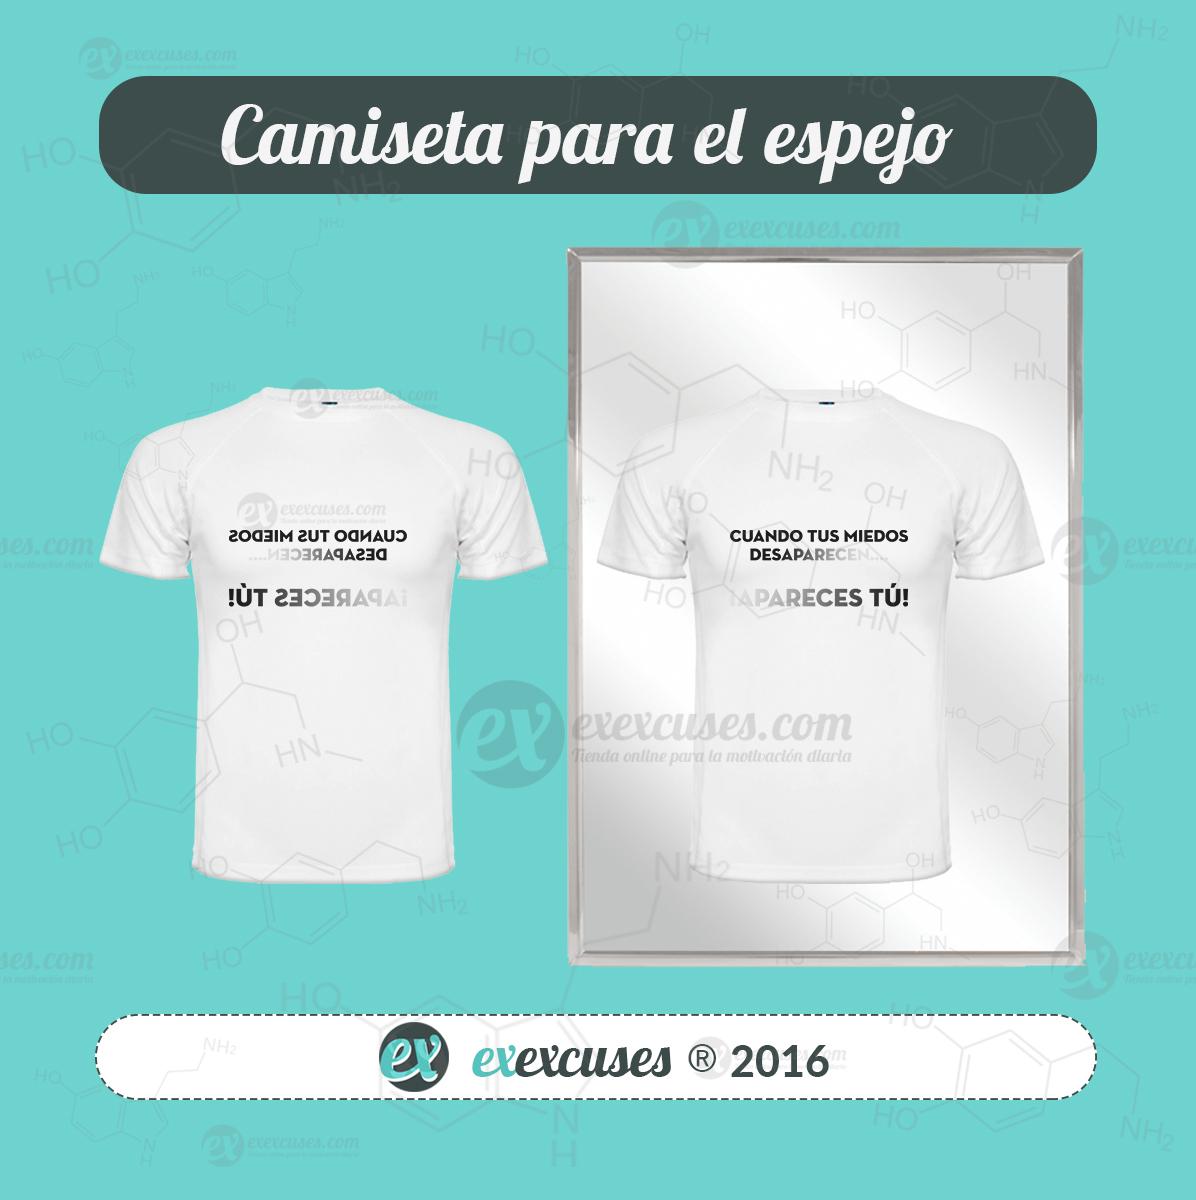 Camiseta espejo miedos desaparecen exexcuses.com®